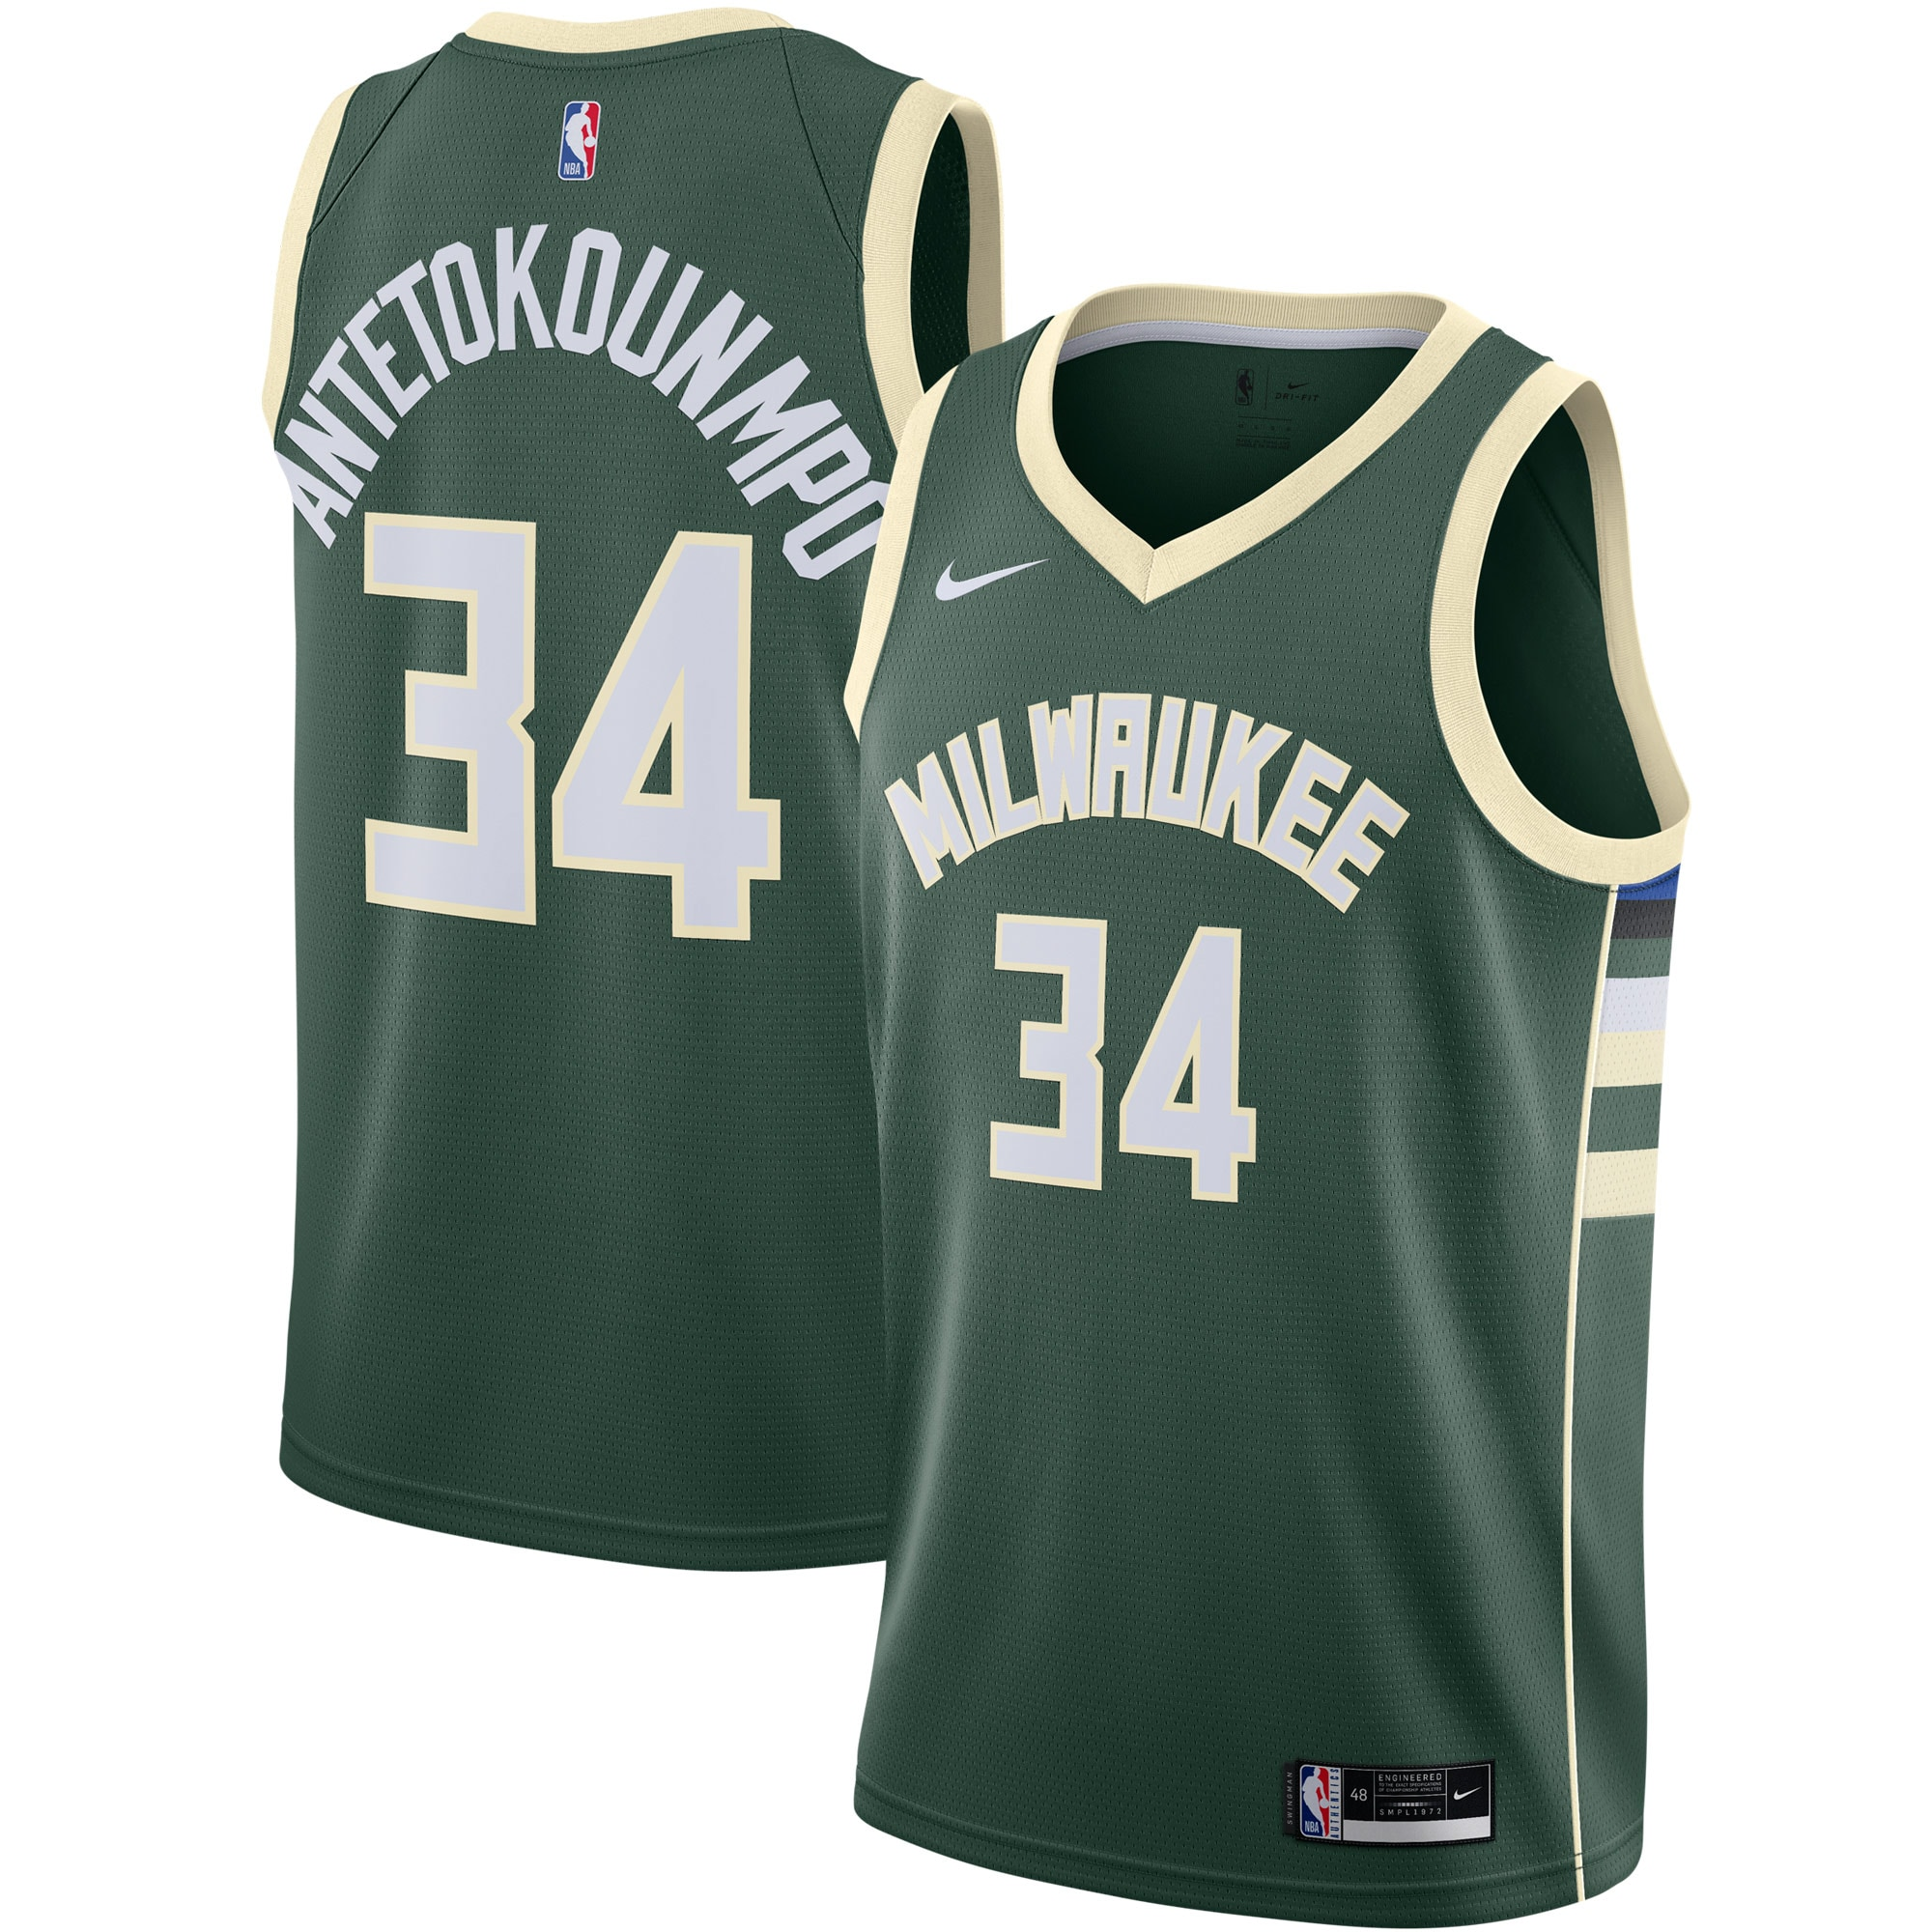 Giannis Antetokounmpo Milwaukee Bucks Nike 2020/21 Swingman Jersey Green - Icon Edition